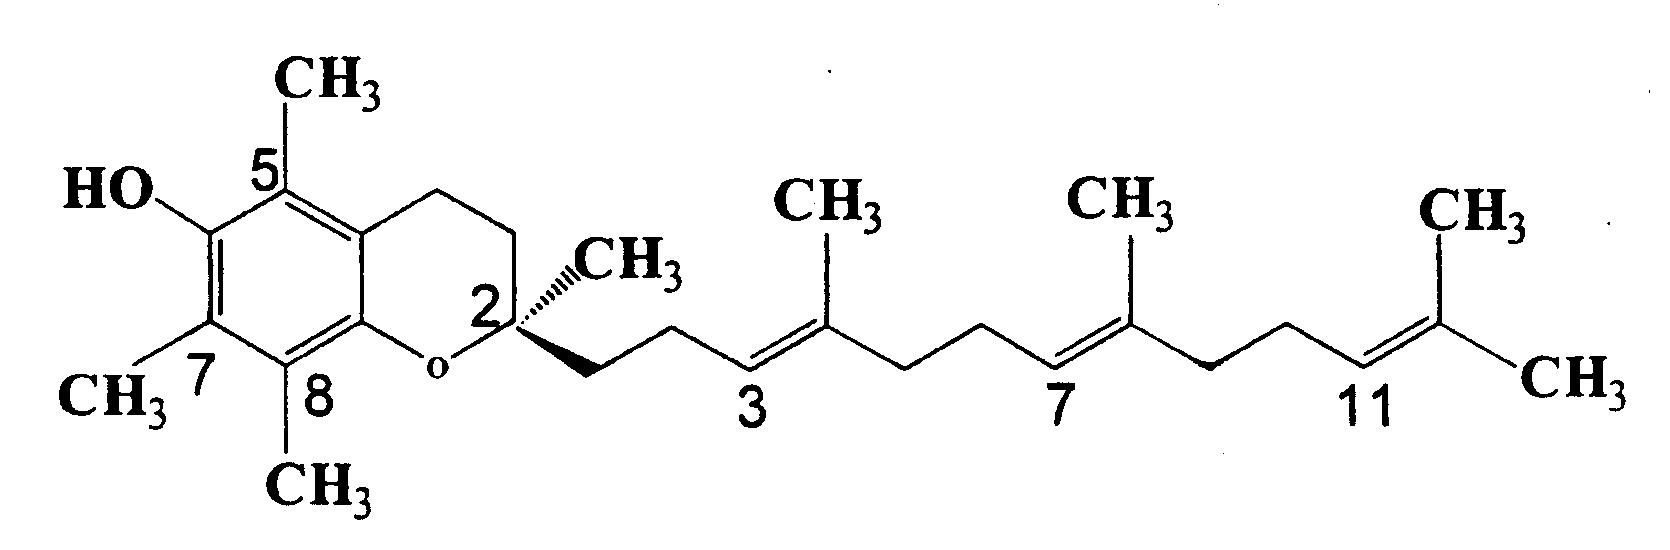 Figure 112001030703581-pct00004